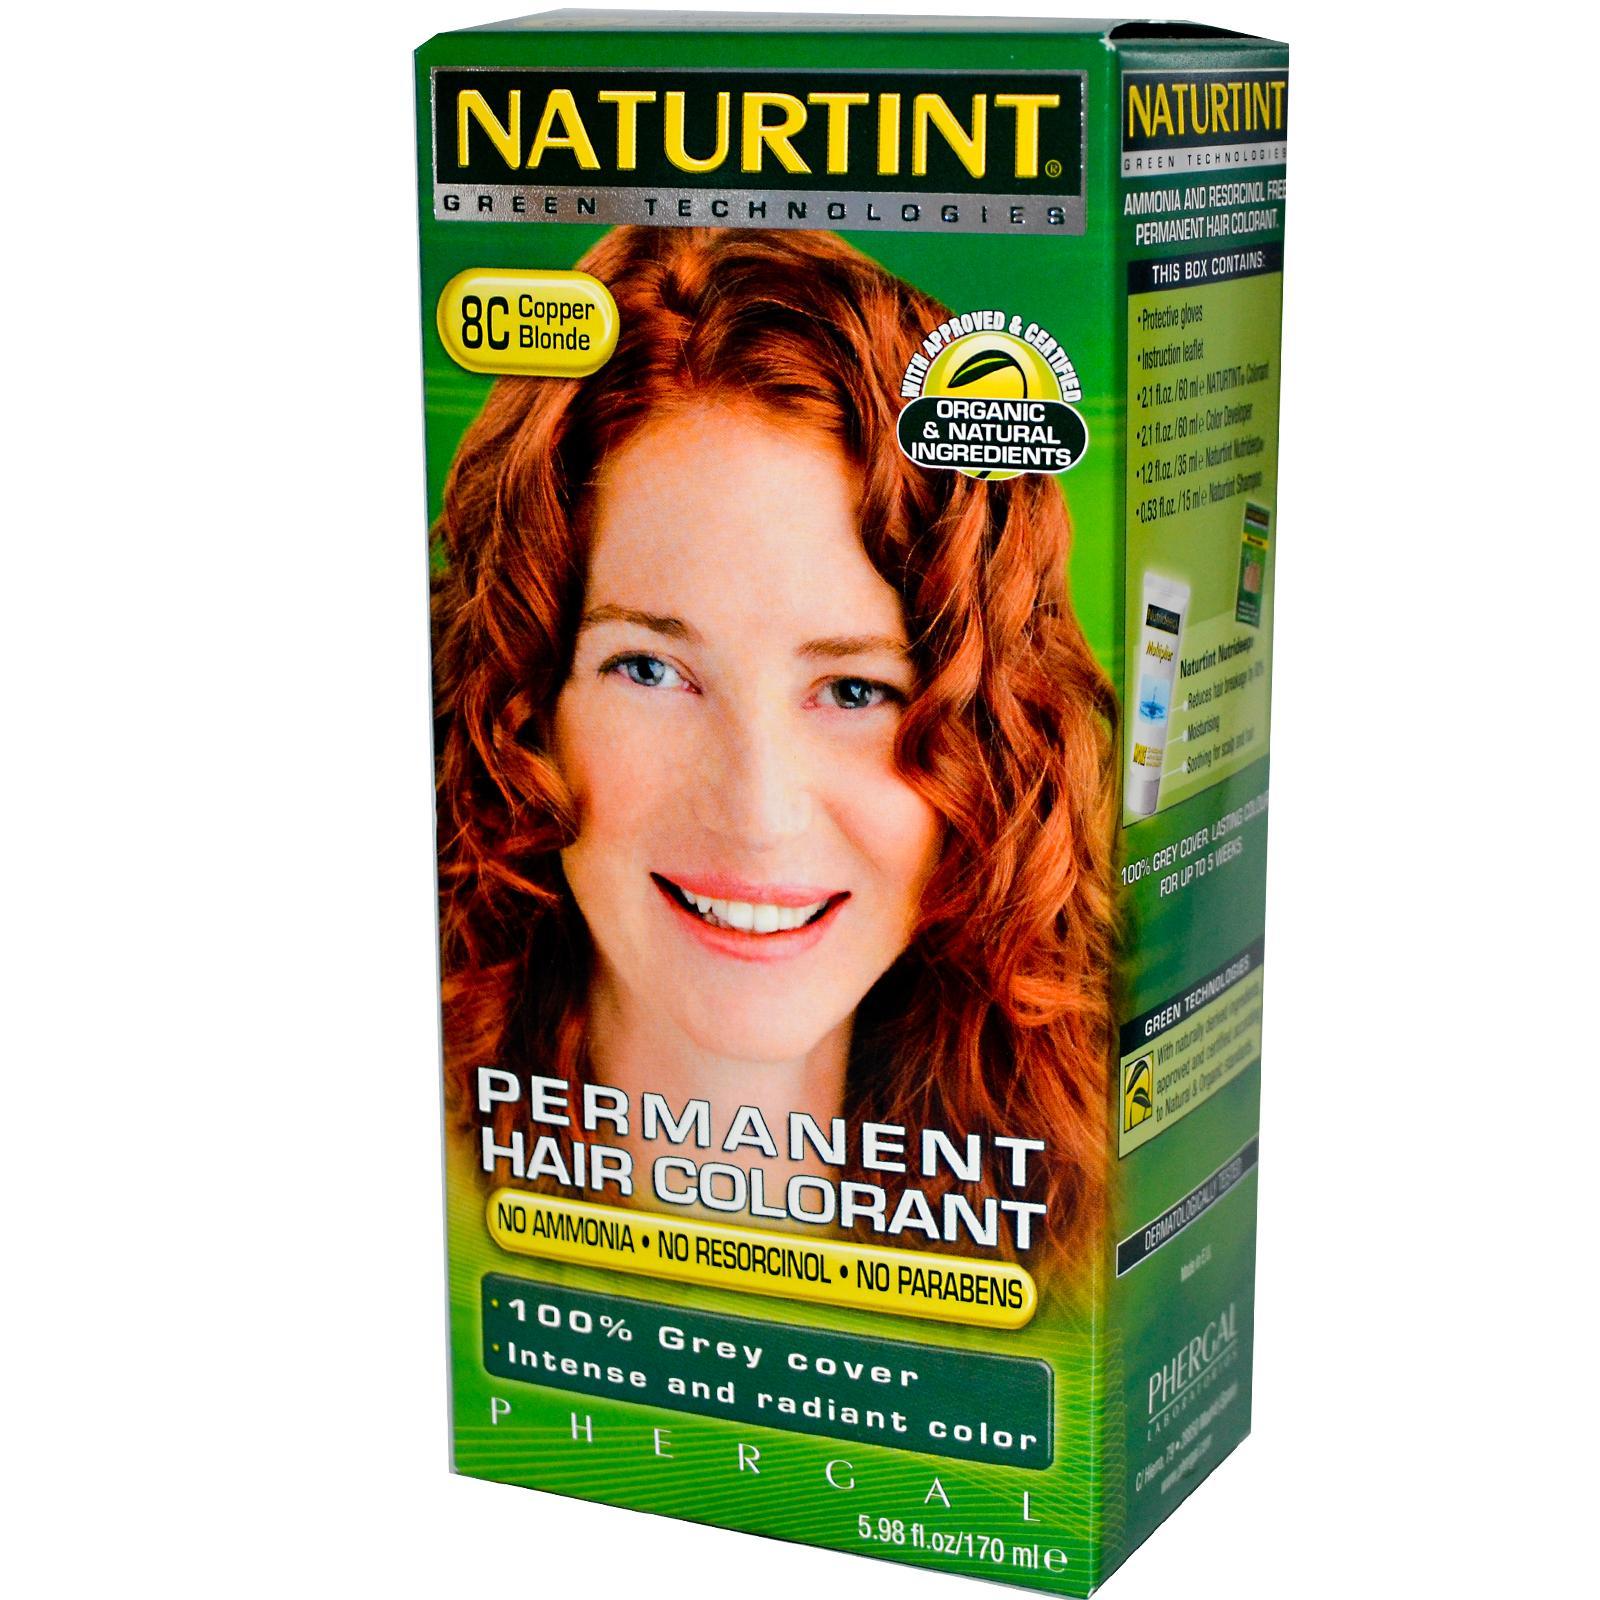 Naturtint 8c Copper Blonde Hair Color (1xKit)